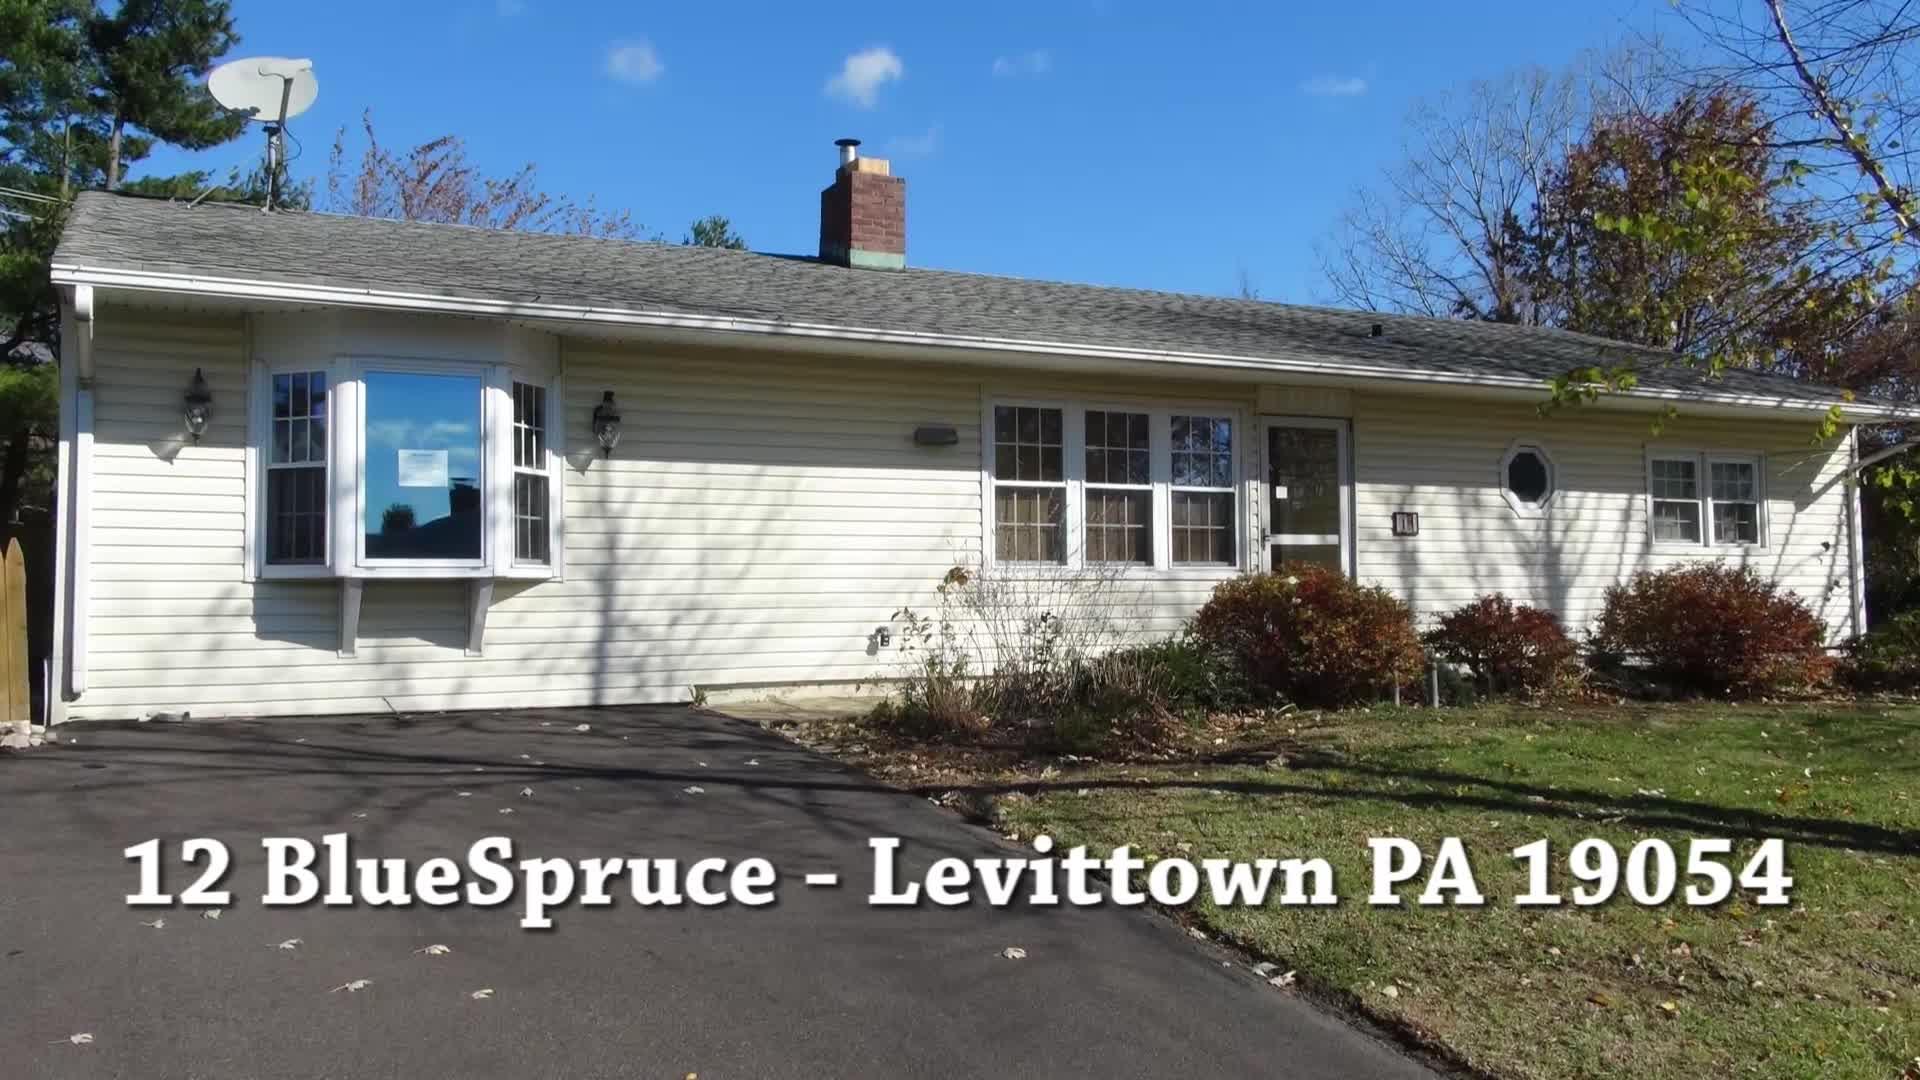 12 BlueSpruce Levittown PA 19054 – Foreclosure Properties Levittown PA 19054